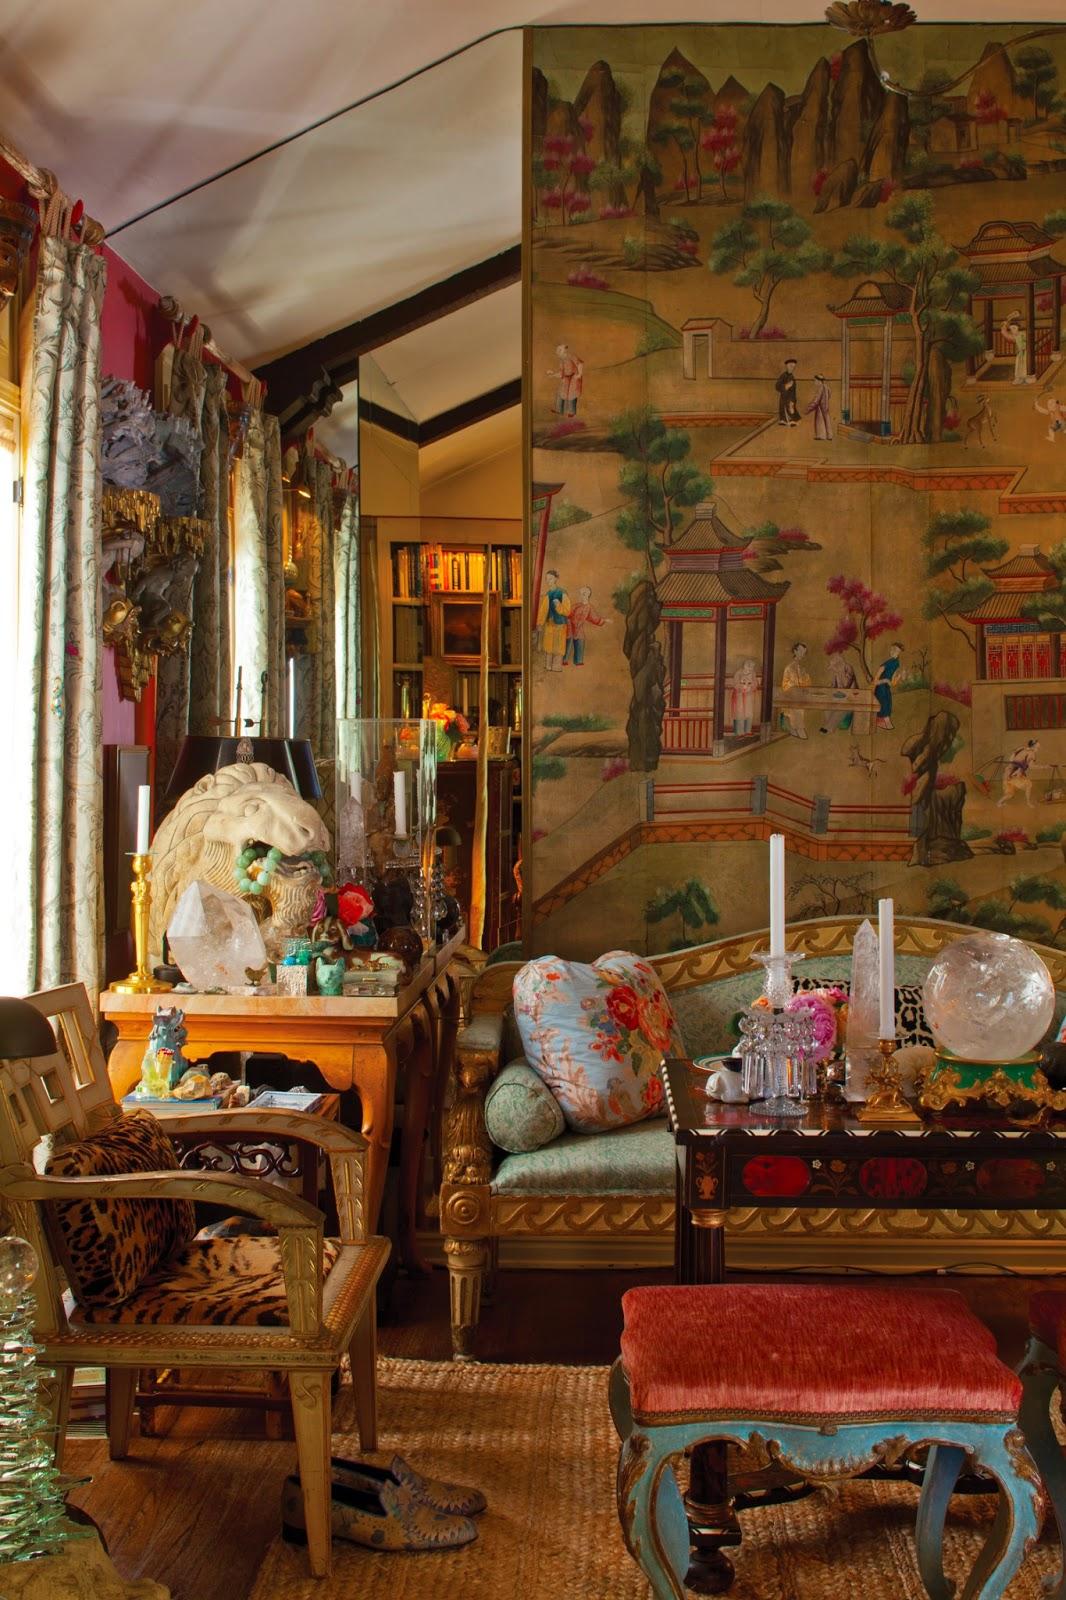 Homebuildlife fortuny interiors luxurious fabrics in real homes - Bohemian interior ...